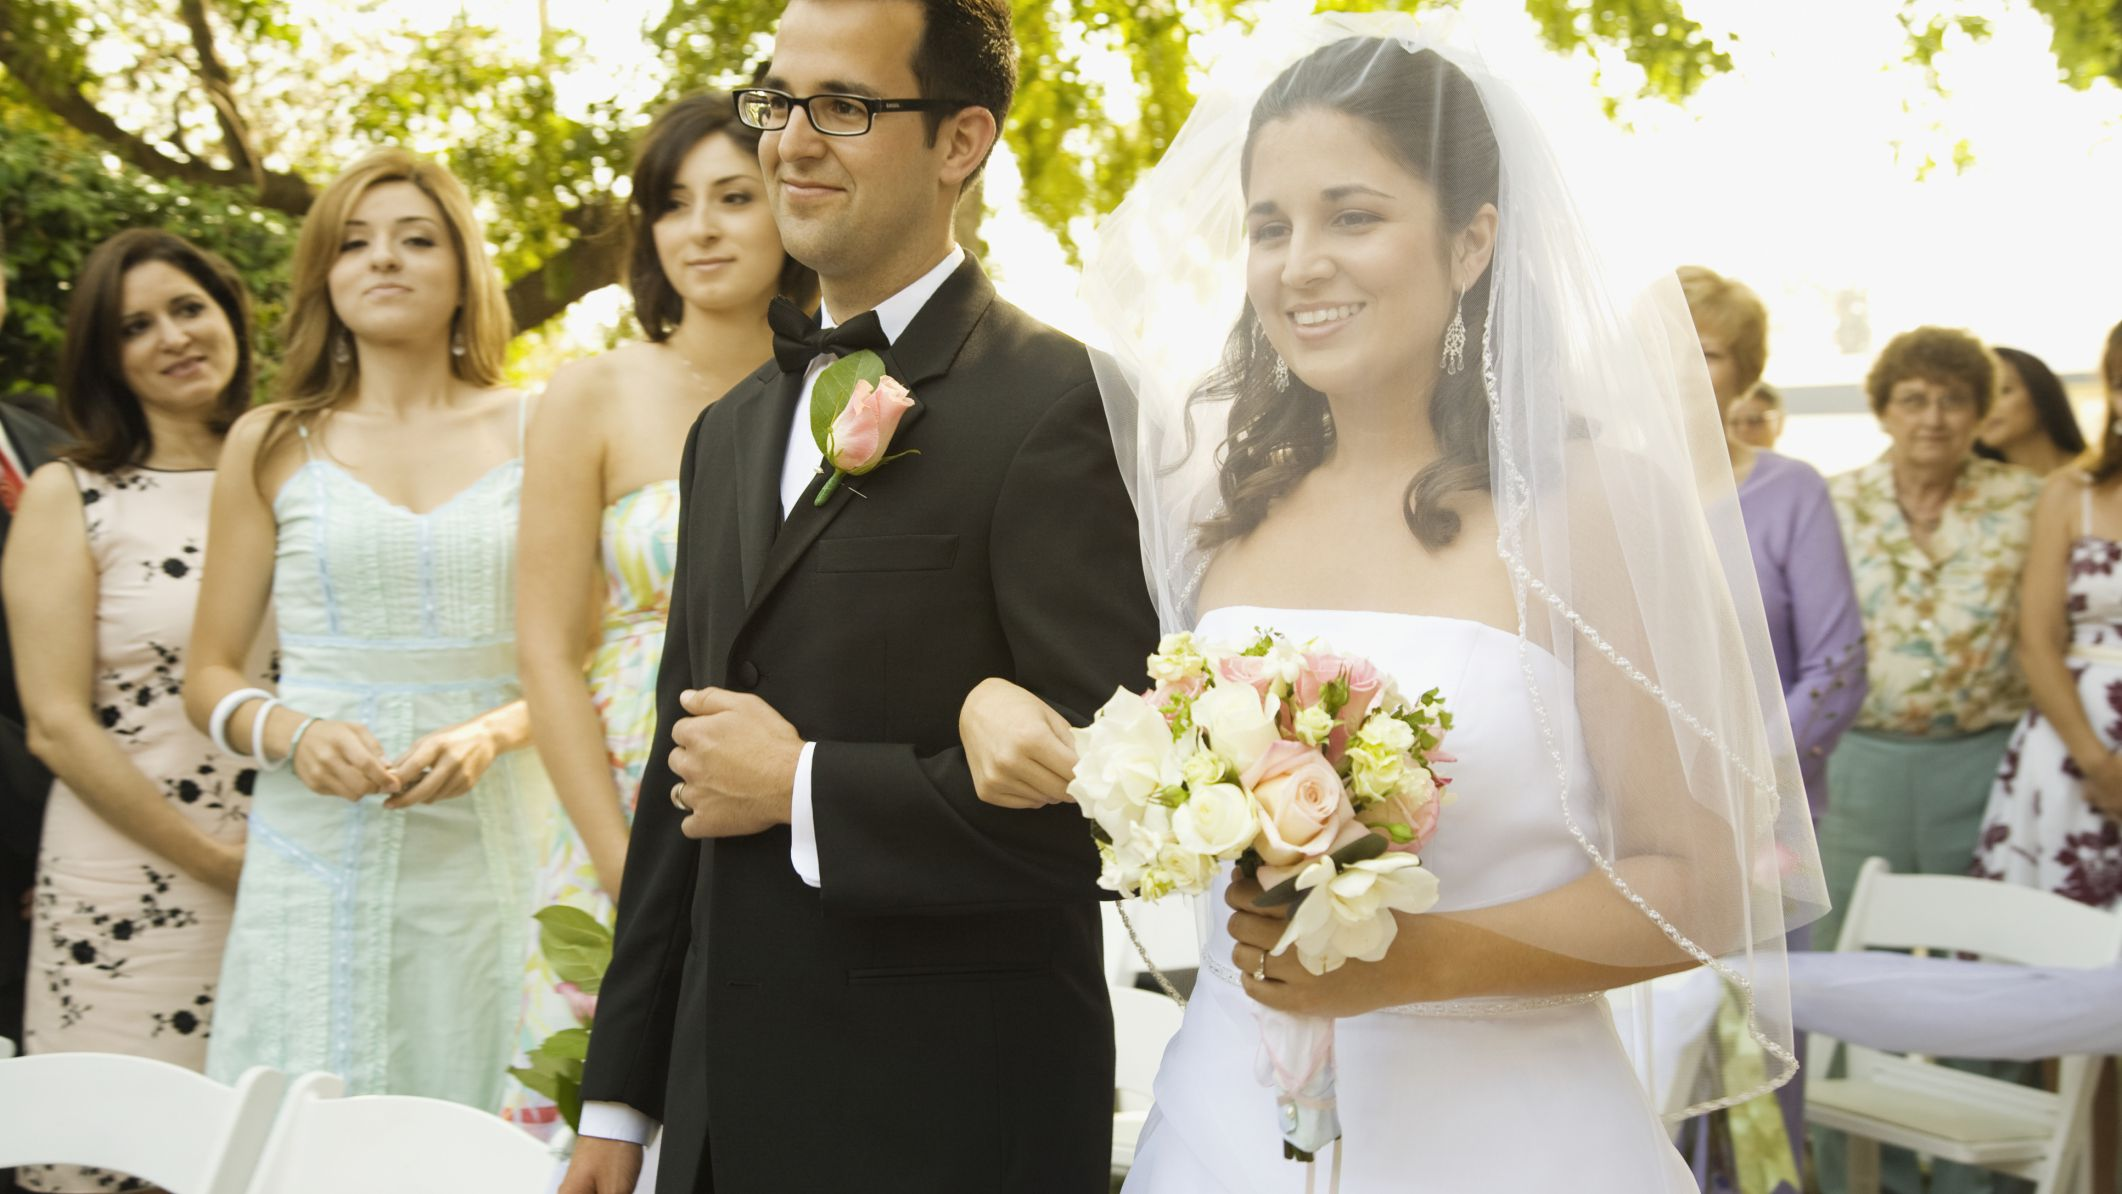 Four Common Wedding Ceremony Songs To Avoid,Sobieski Vodka Flavors